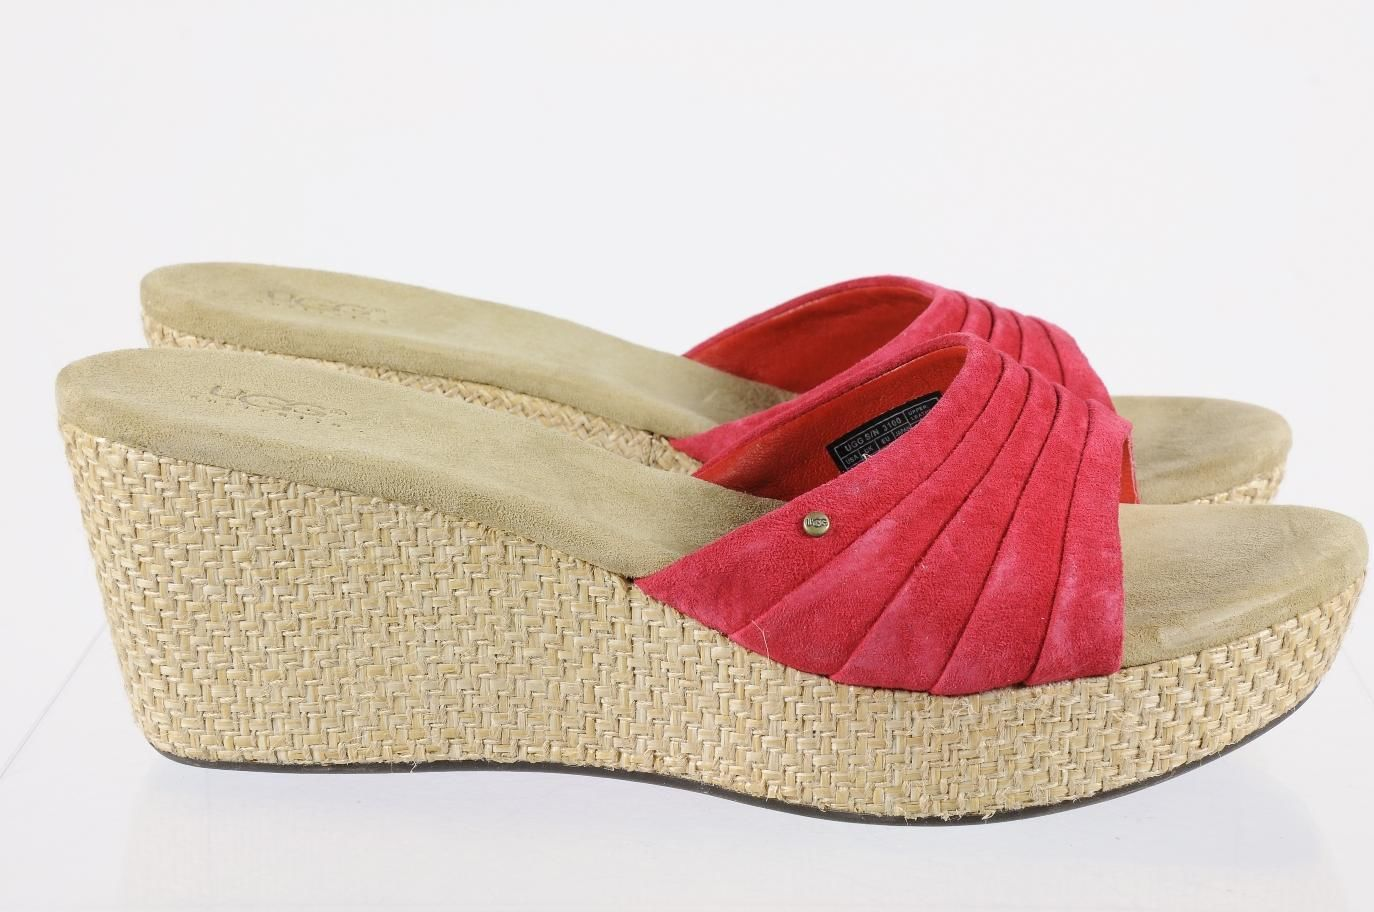 37ea04c82ab Details about Ugg Tan Suede Espadrille Wedge Slides Sandals Shoes Sz ...